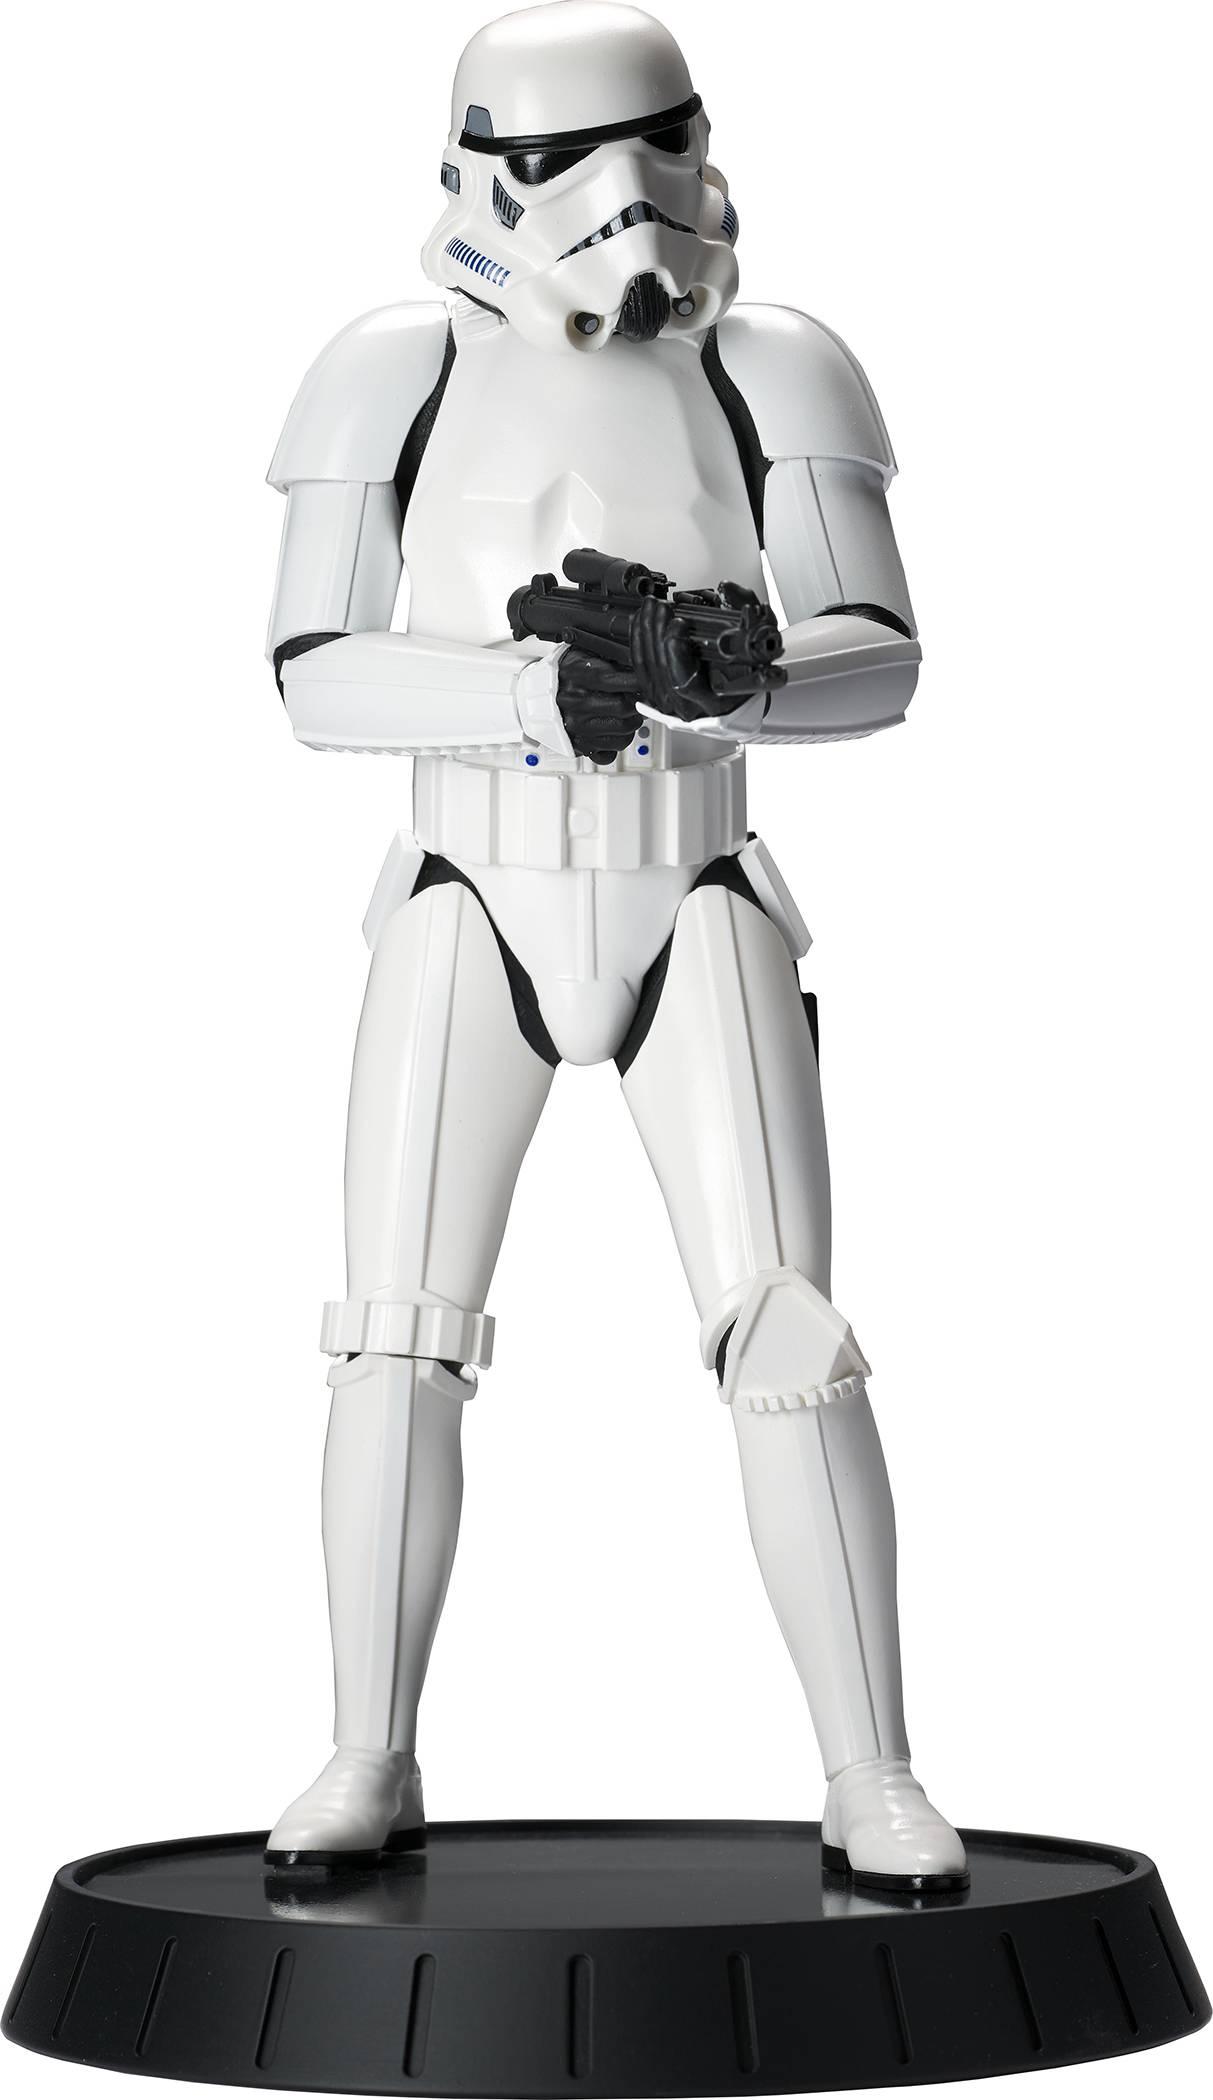 Star Wars Milestones - A New Hope - Stormtrooper Statue